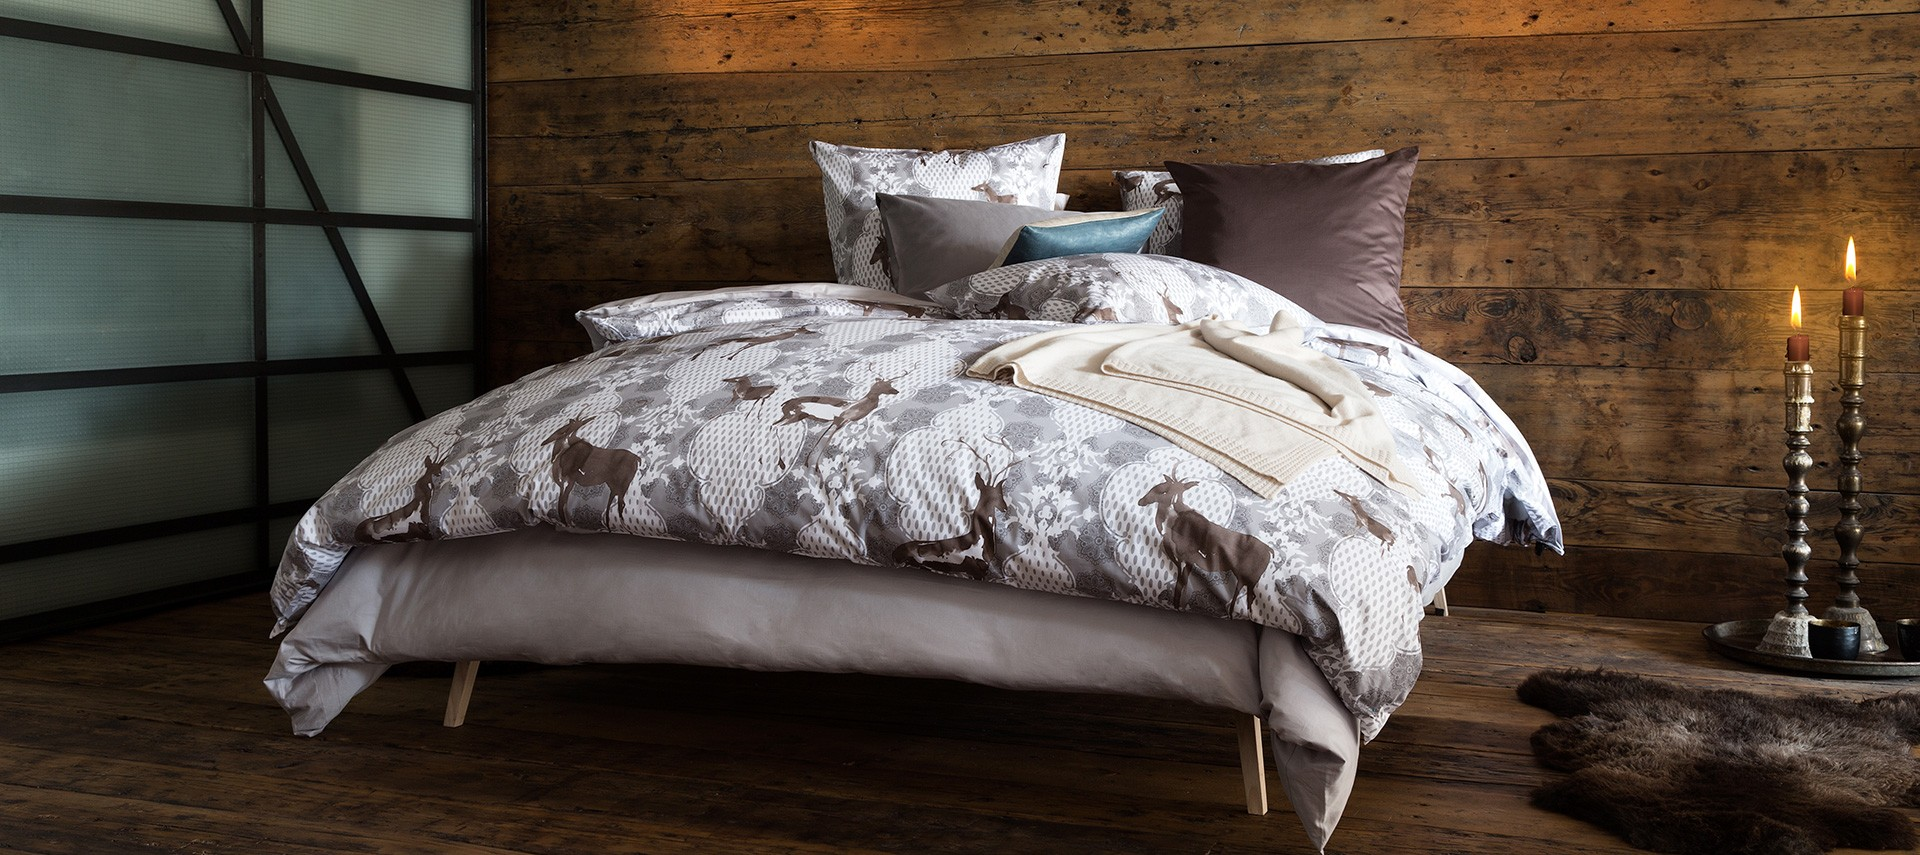 fischbacher belvedere. Black Bedroom Furniture Sets. Home Design Ideas